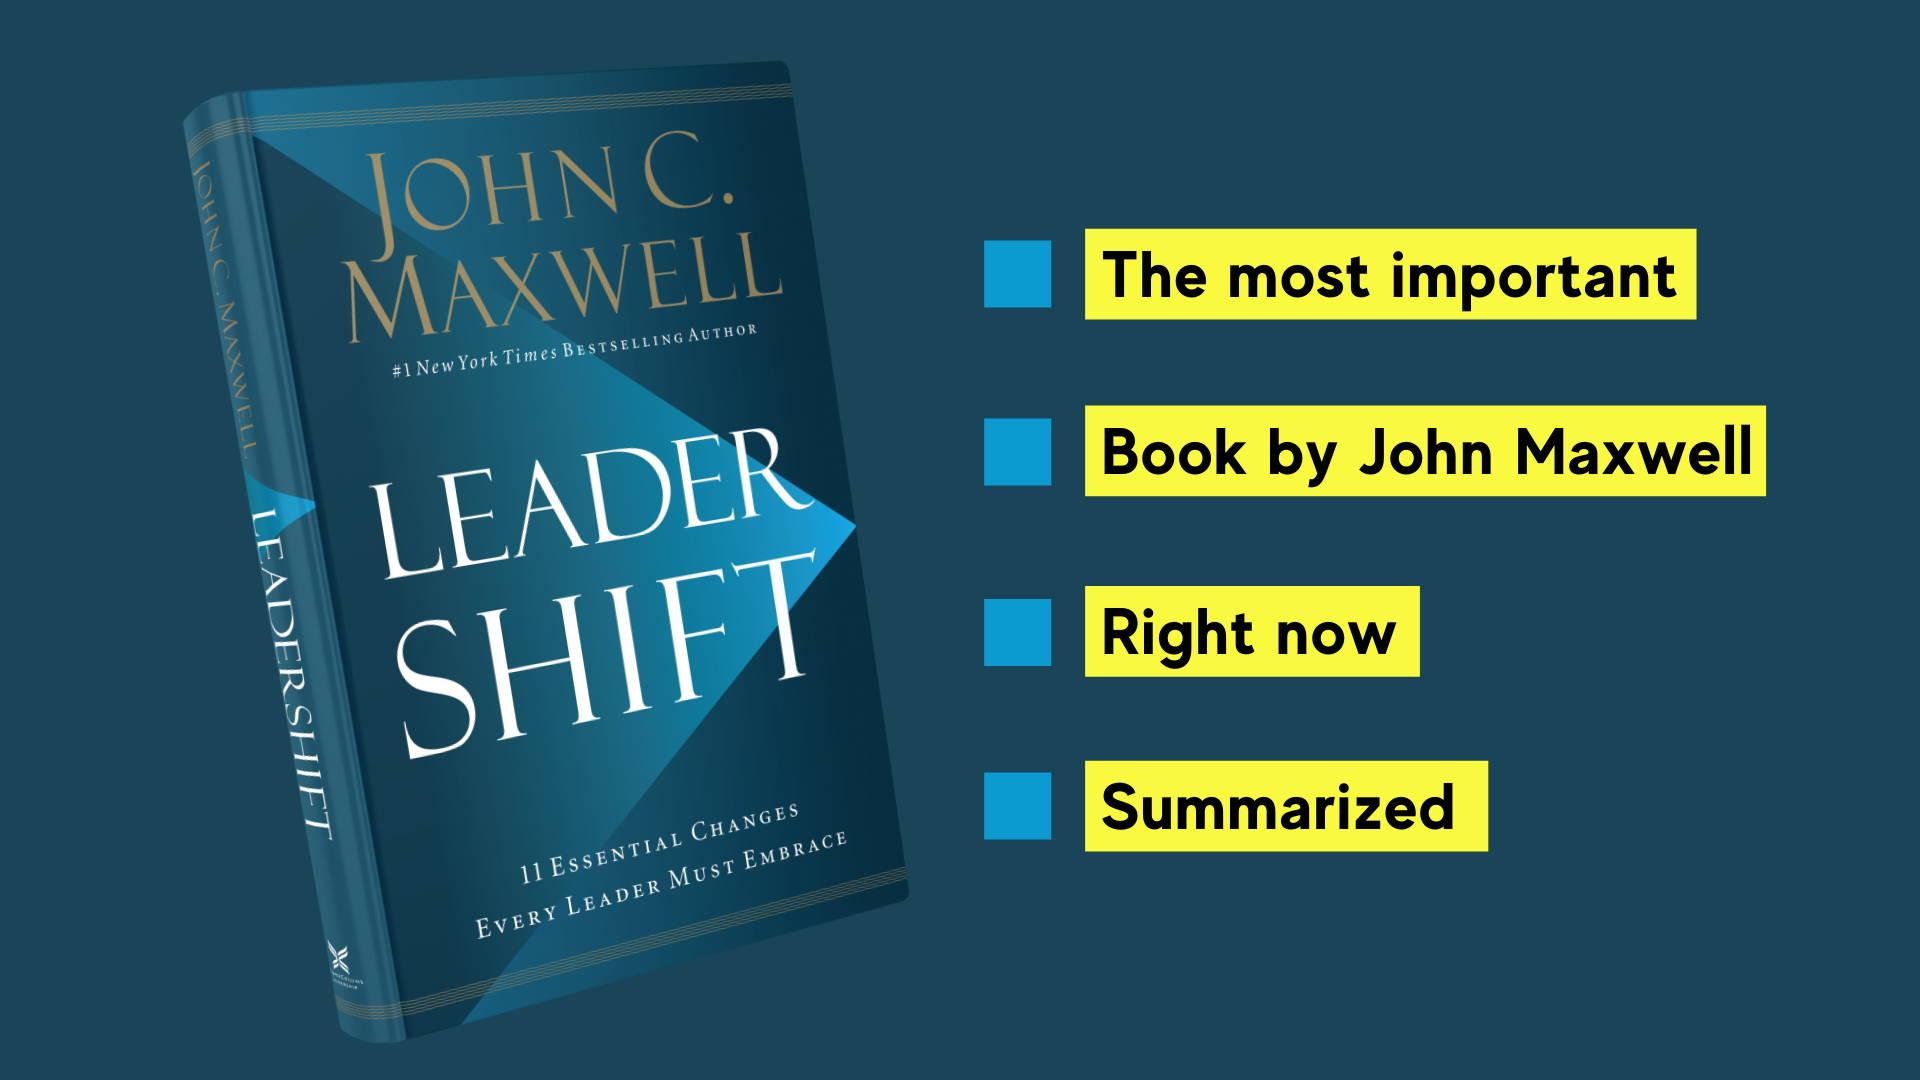 leadershift by john maxwell book summary